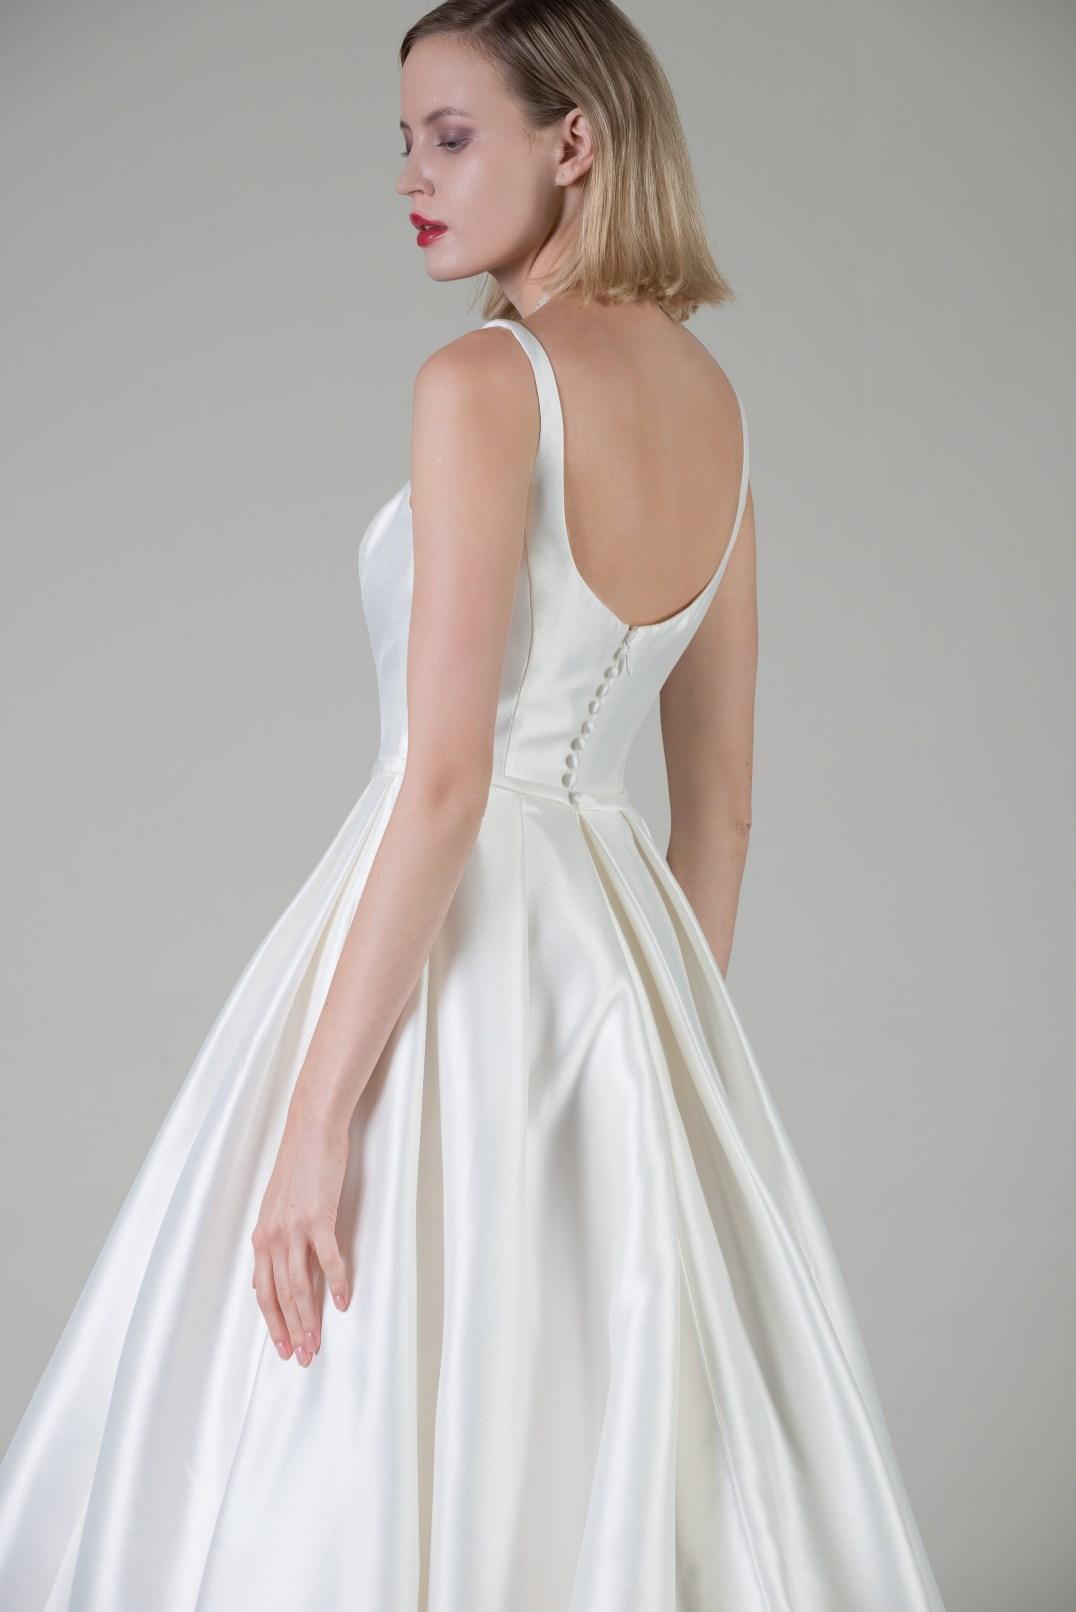 MiaMia Bologna wedding gown